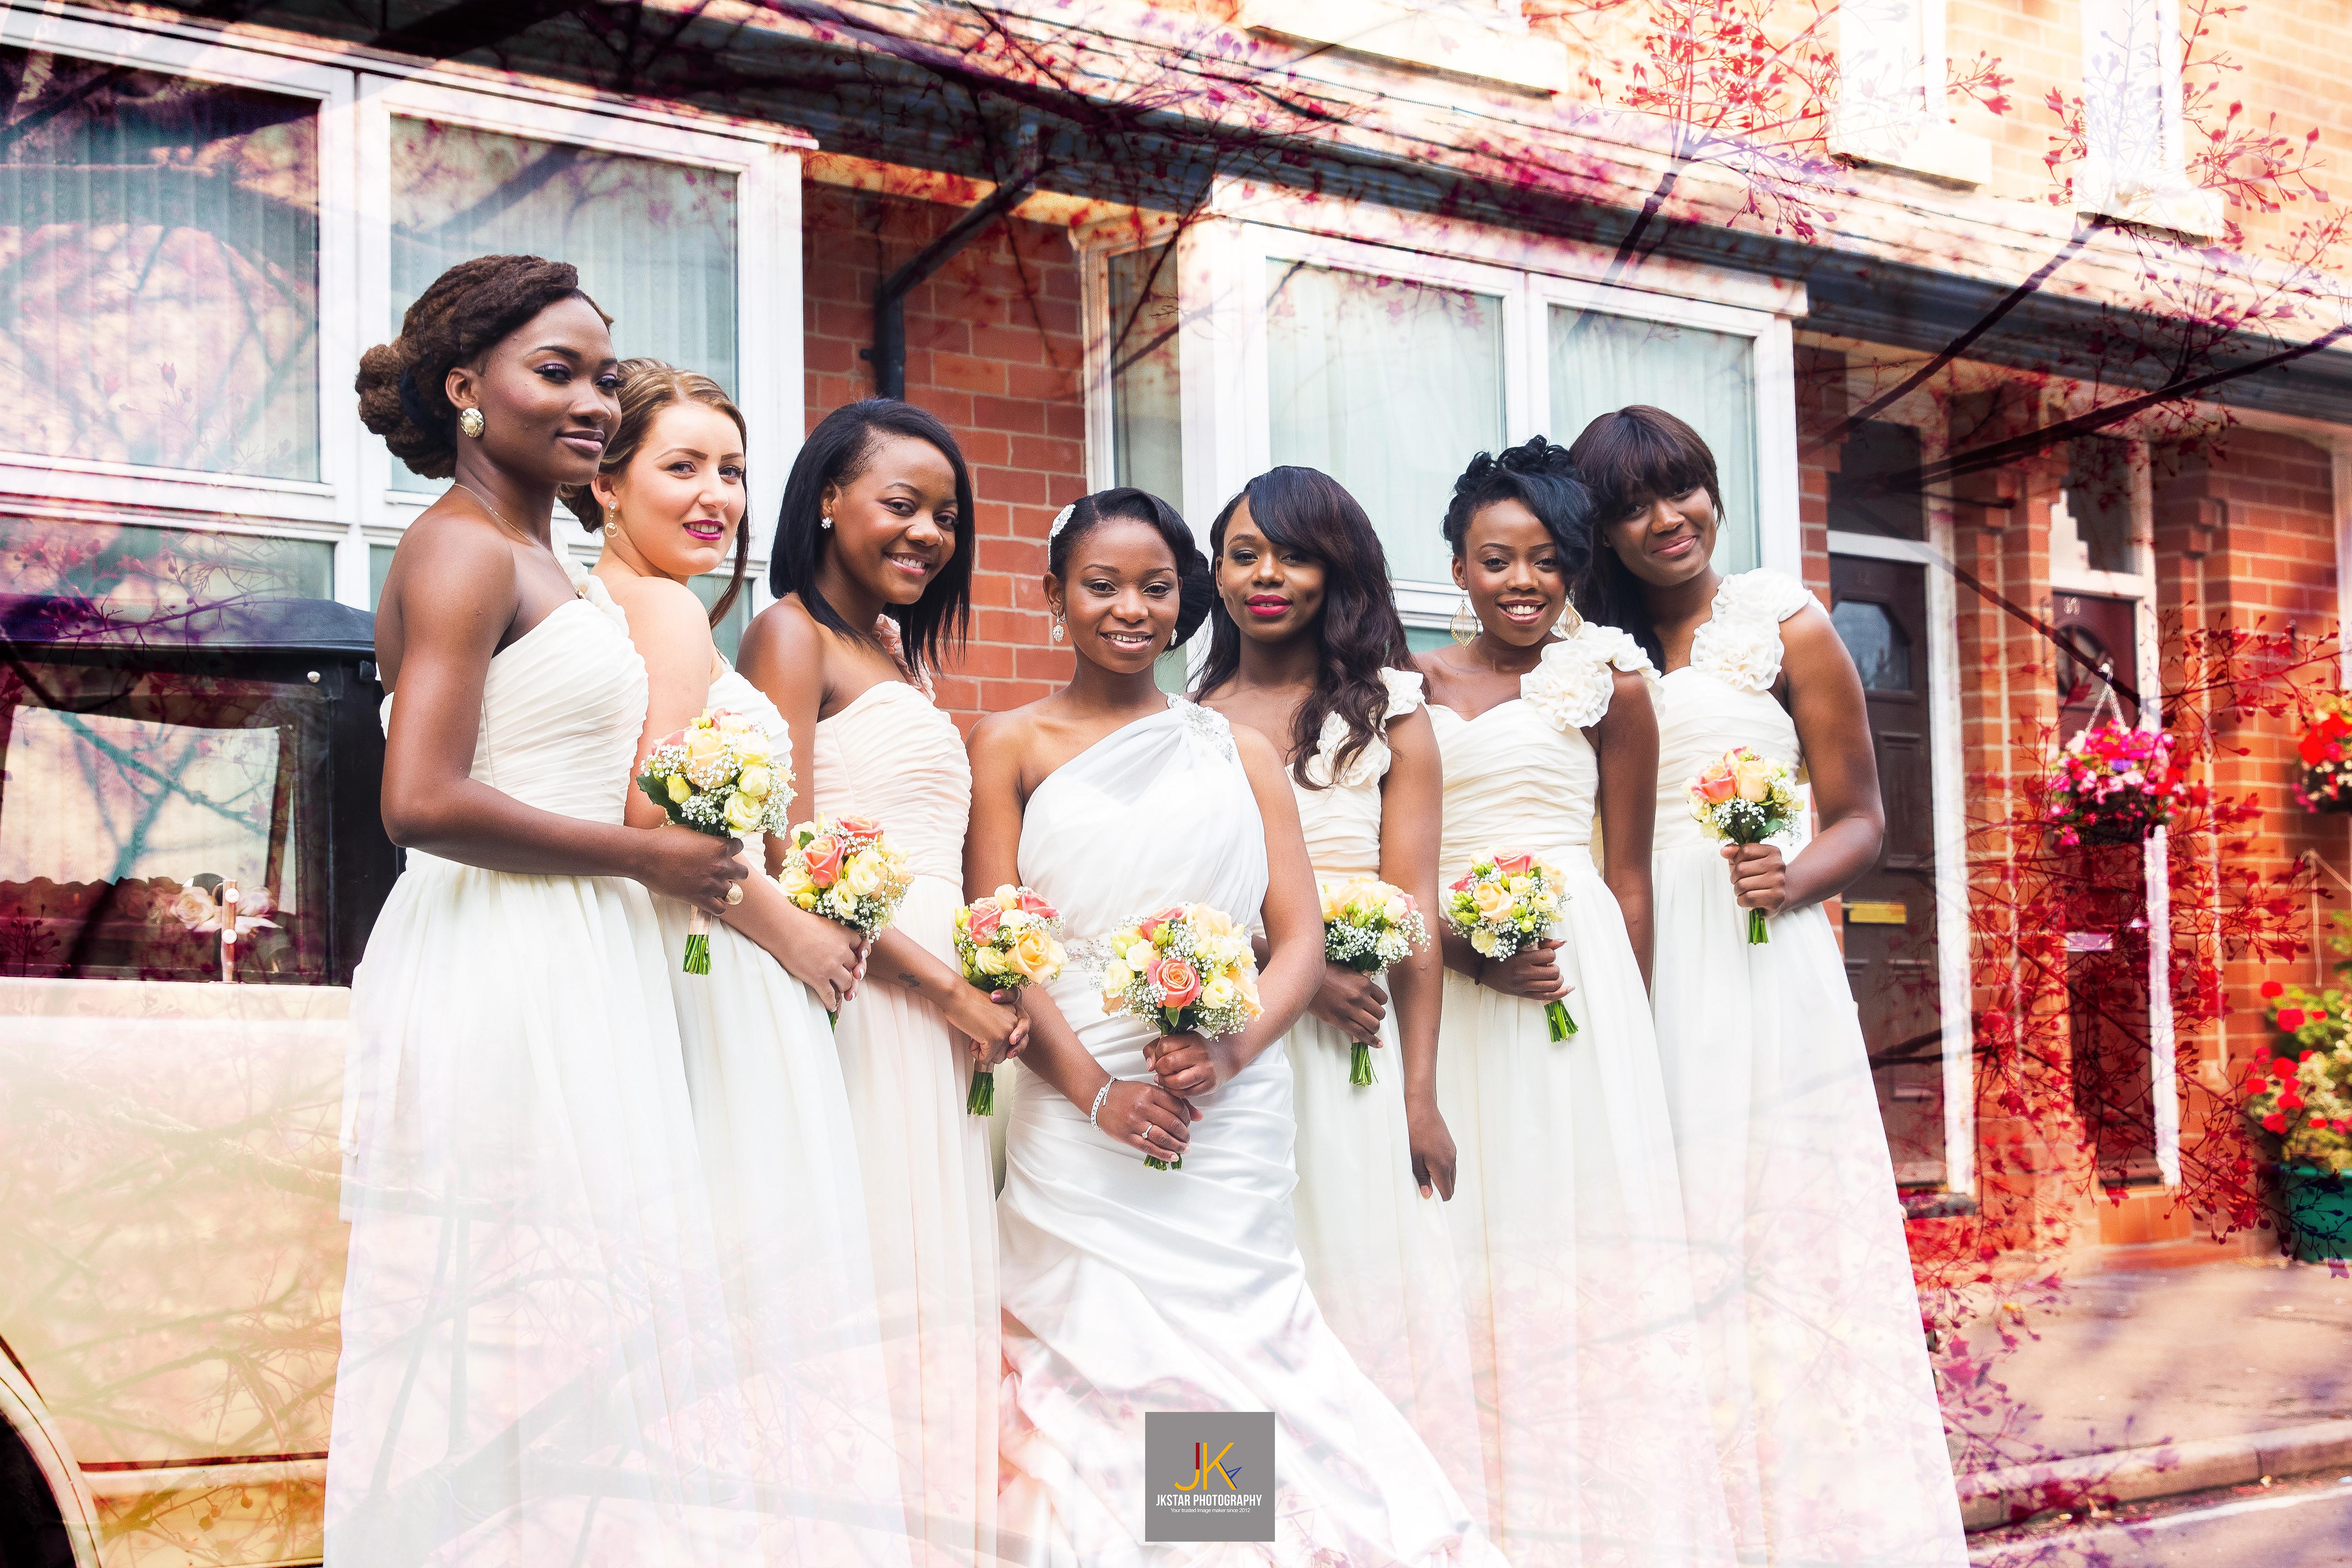 The Bridal Team